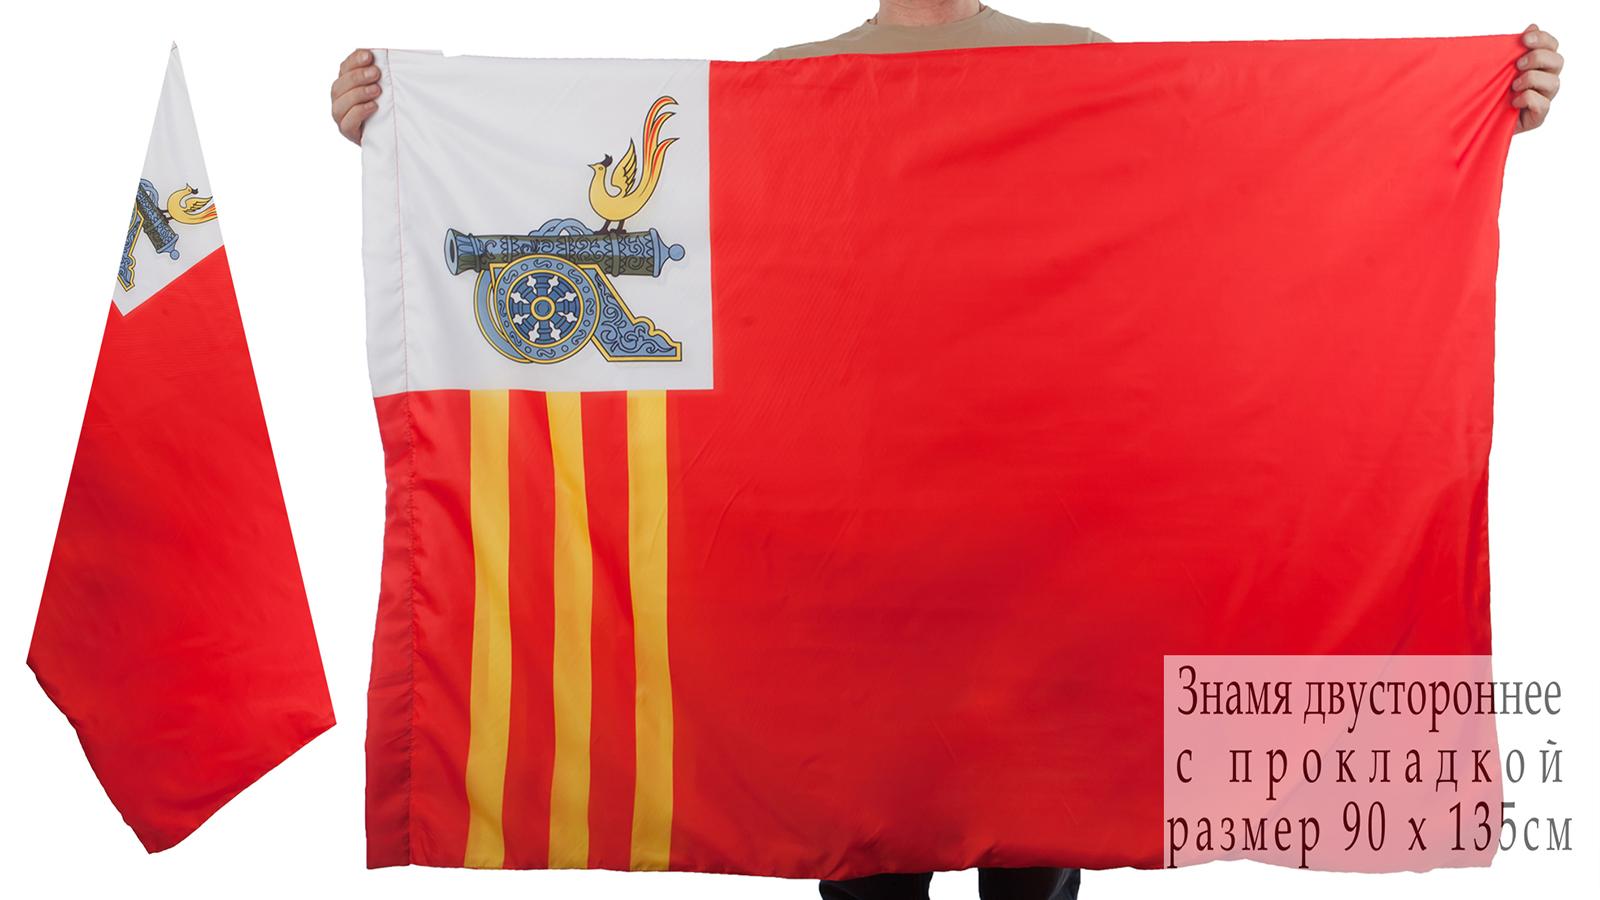 Двухсторонний флаг Смоленска